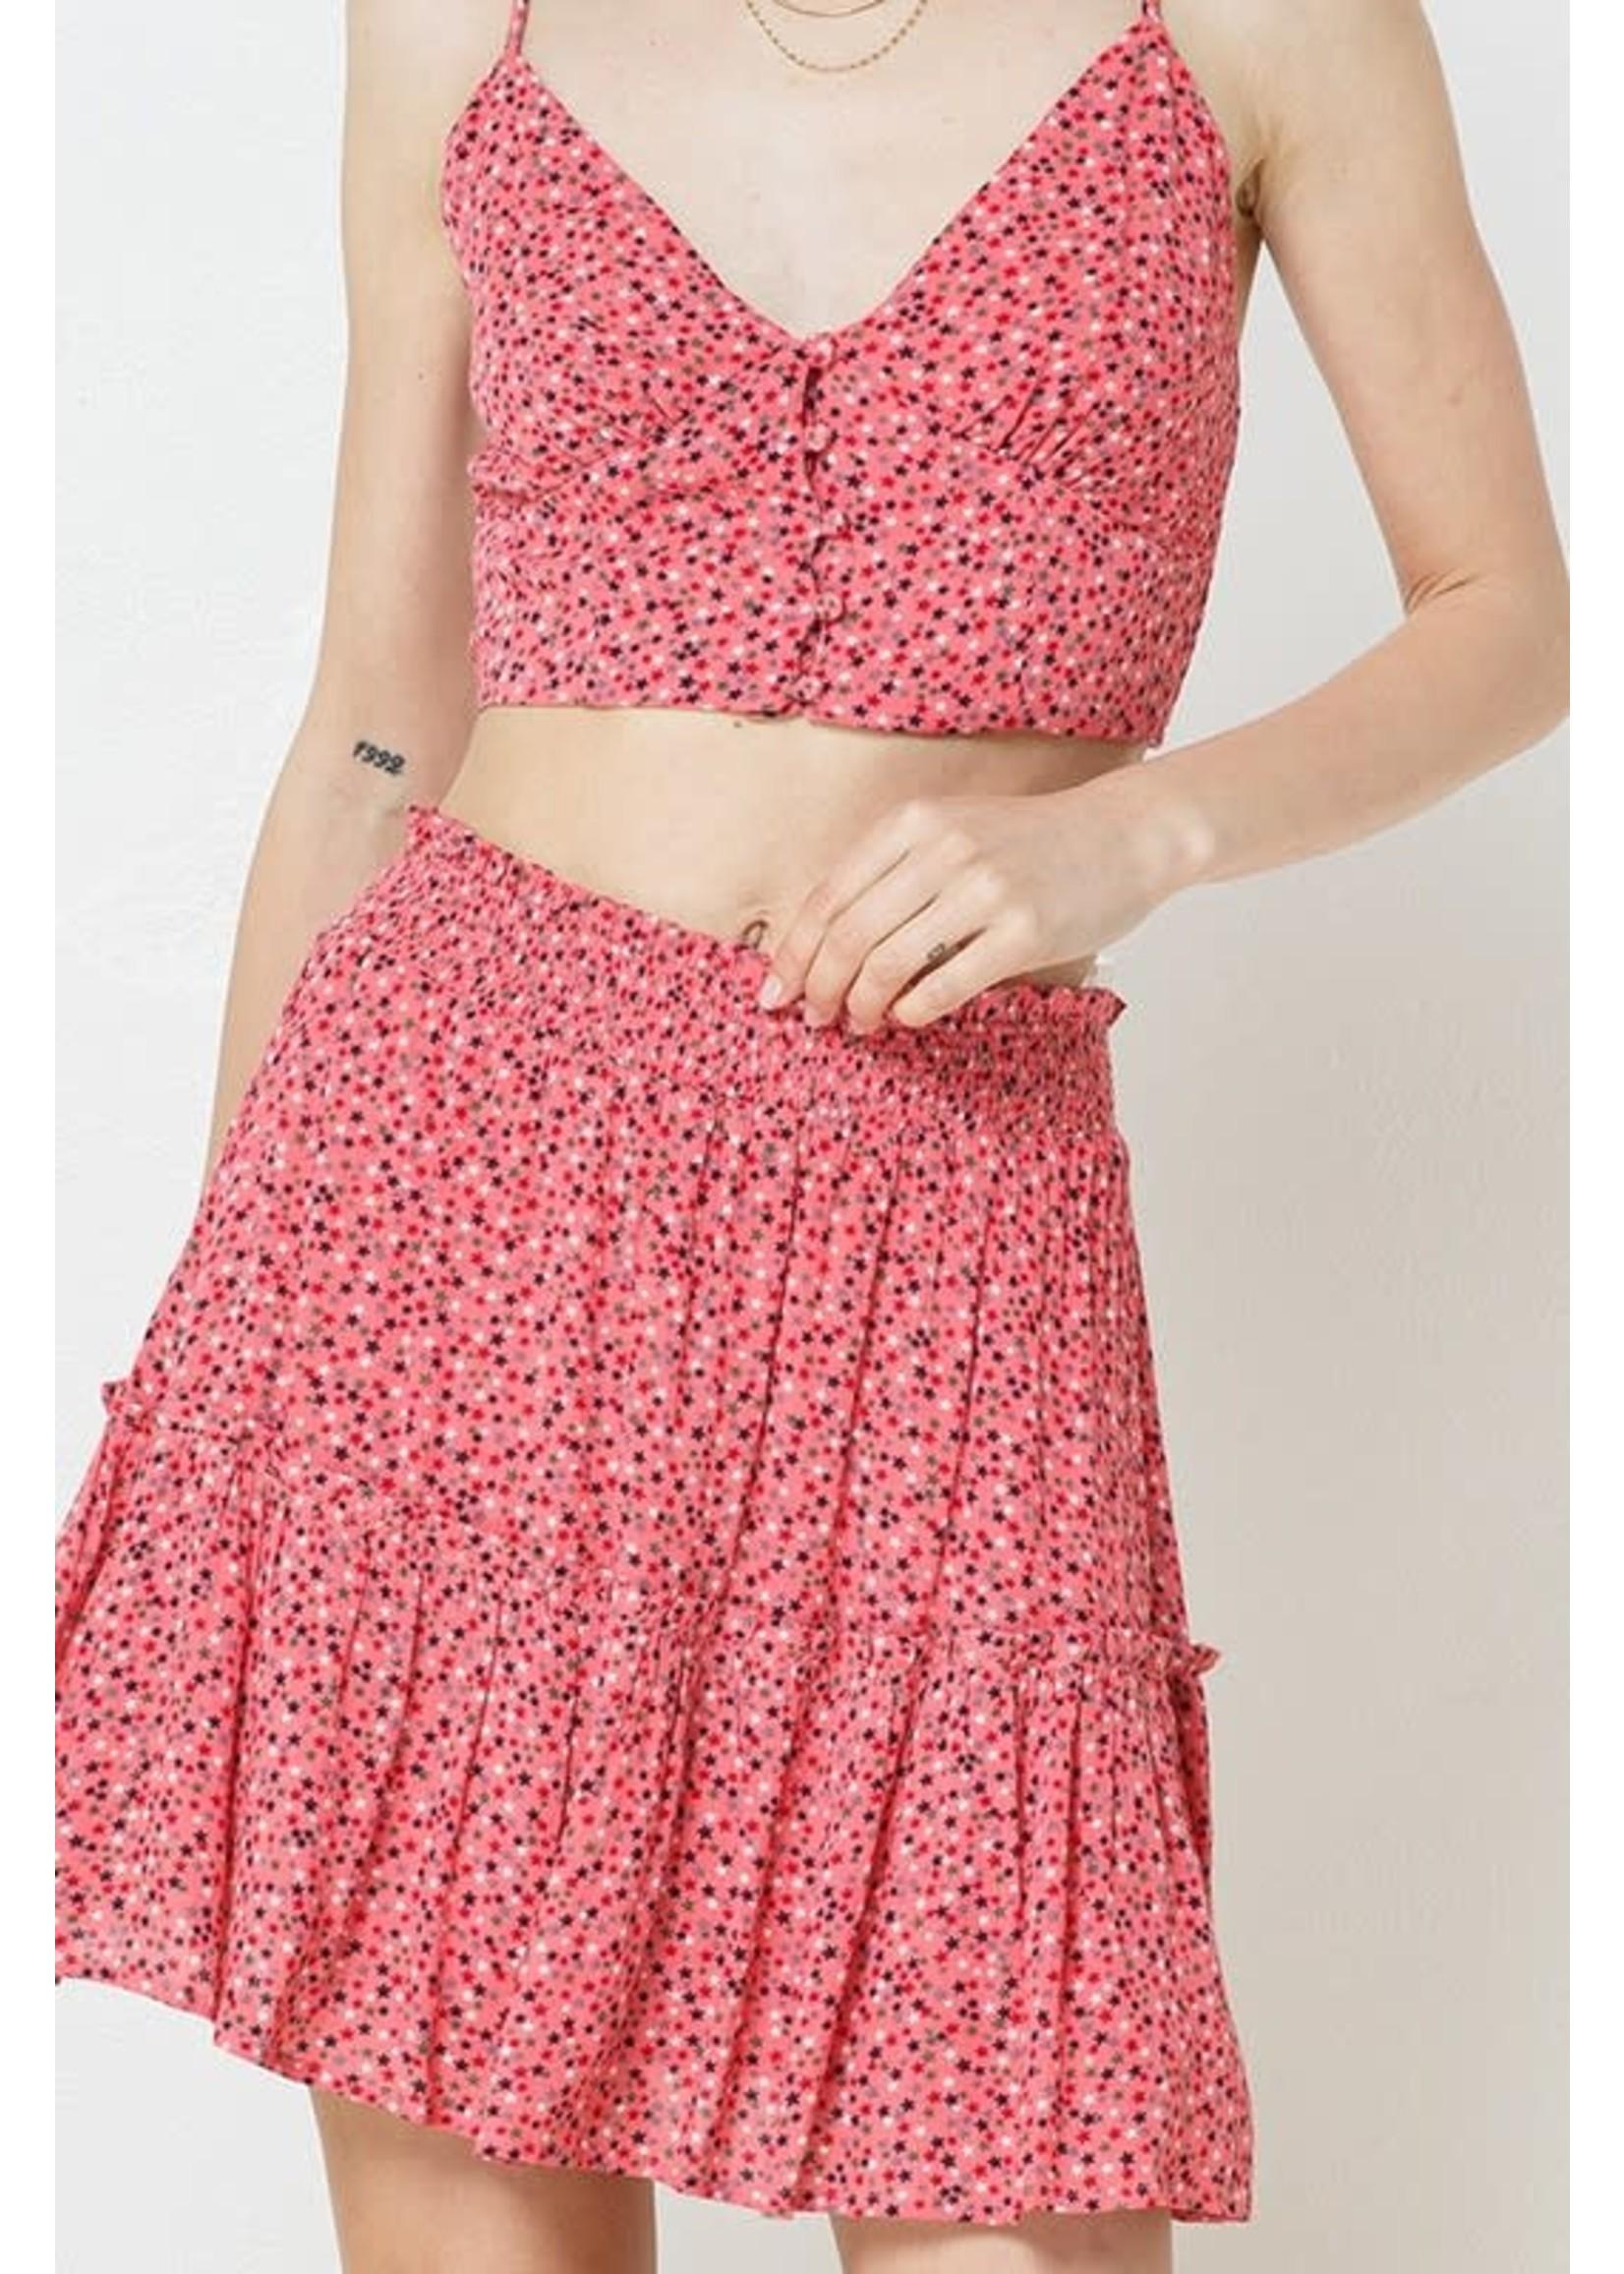 Illa Illa Star Print Crop Top and Ruffled Skirt SET - IM6169B